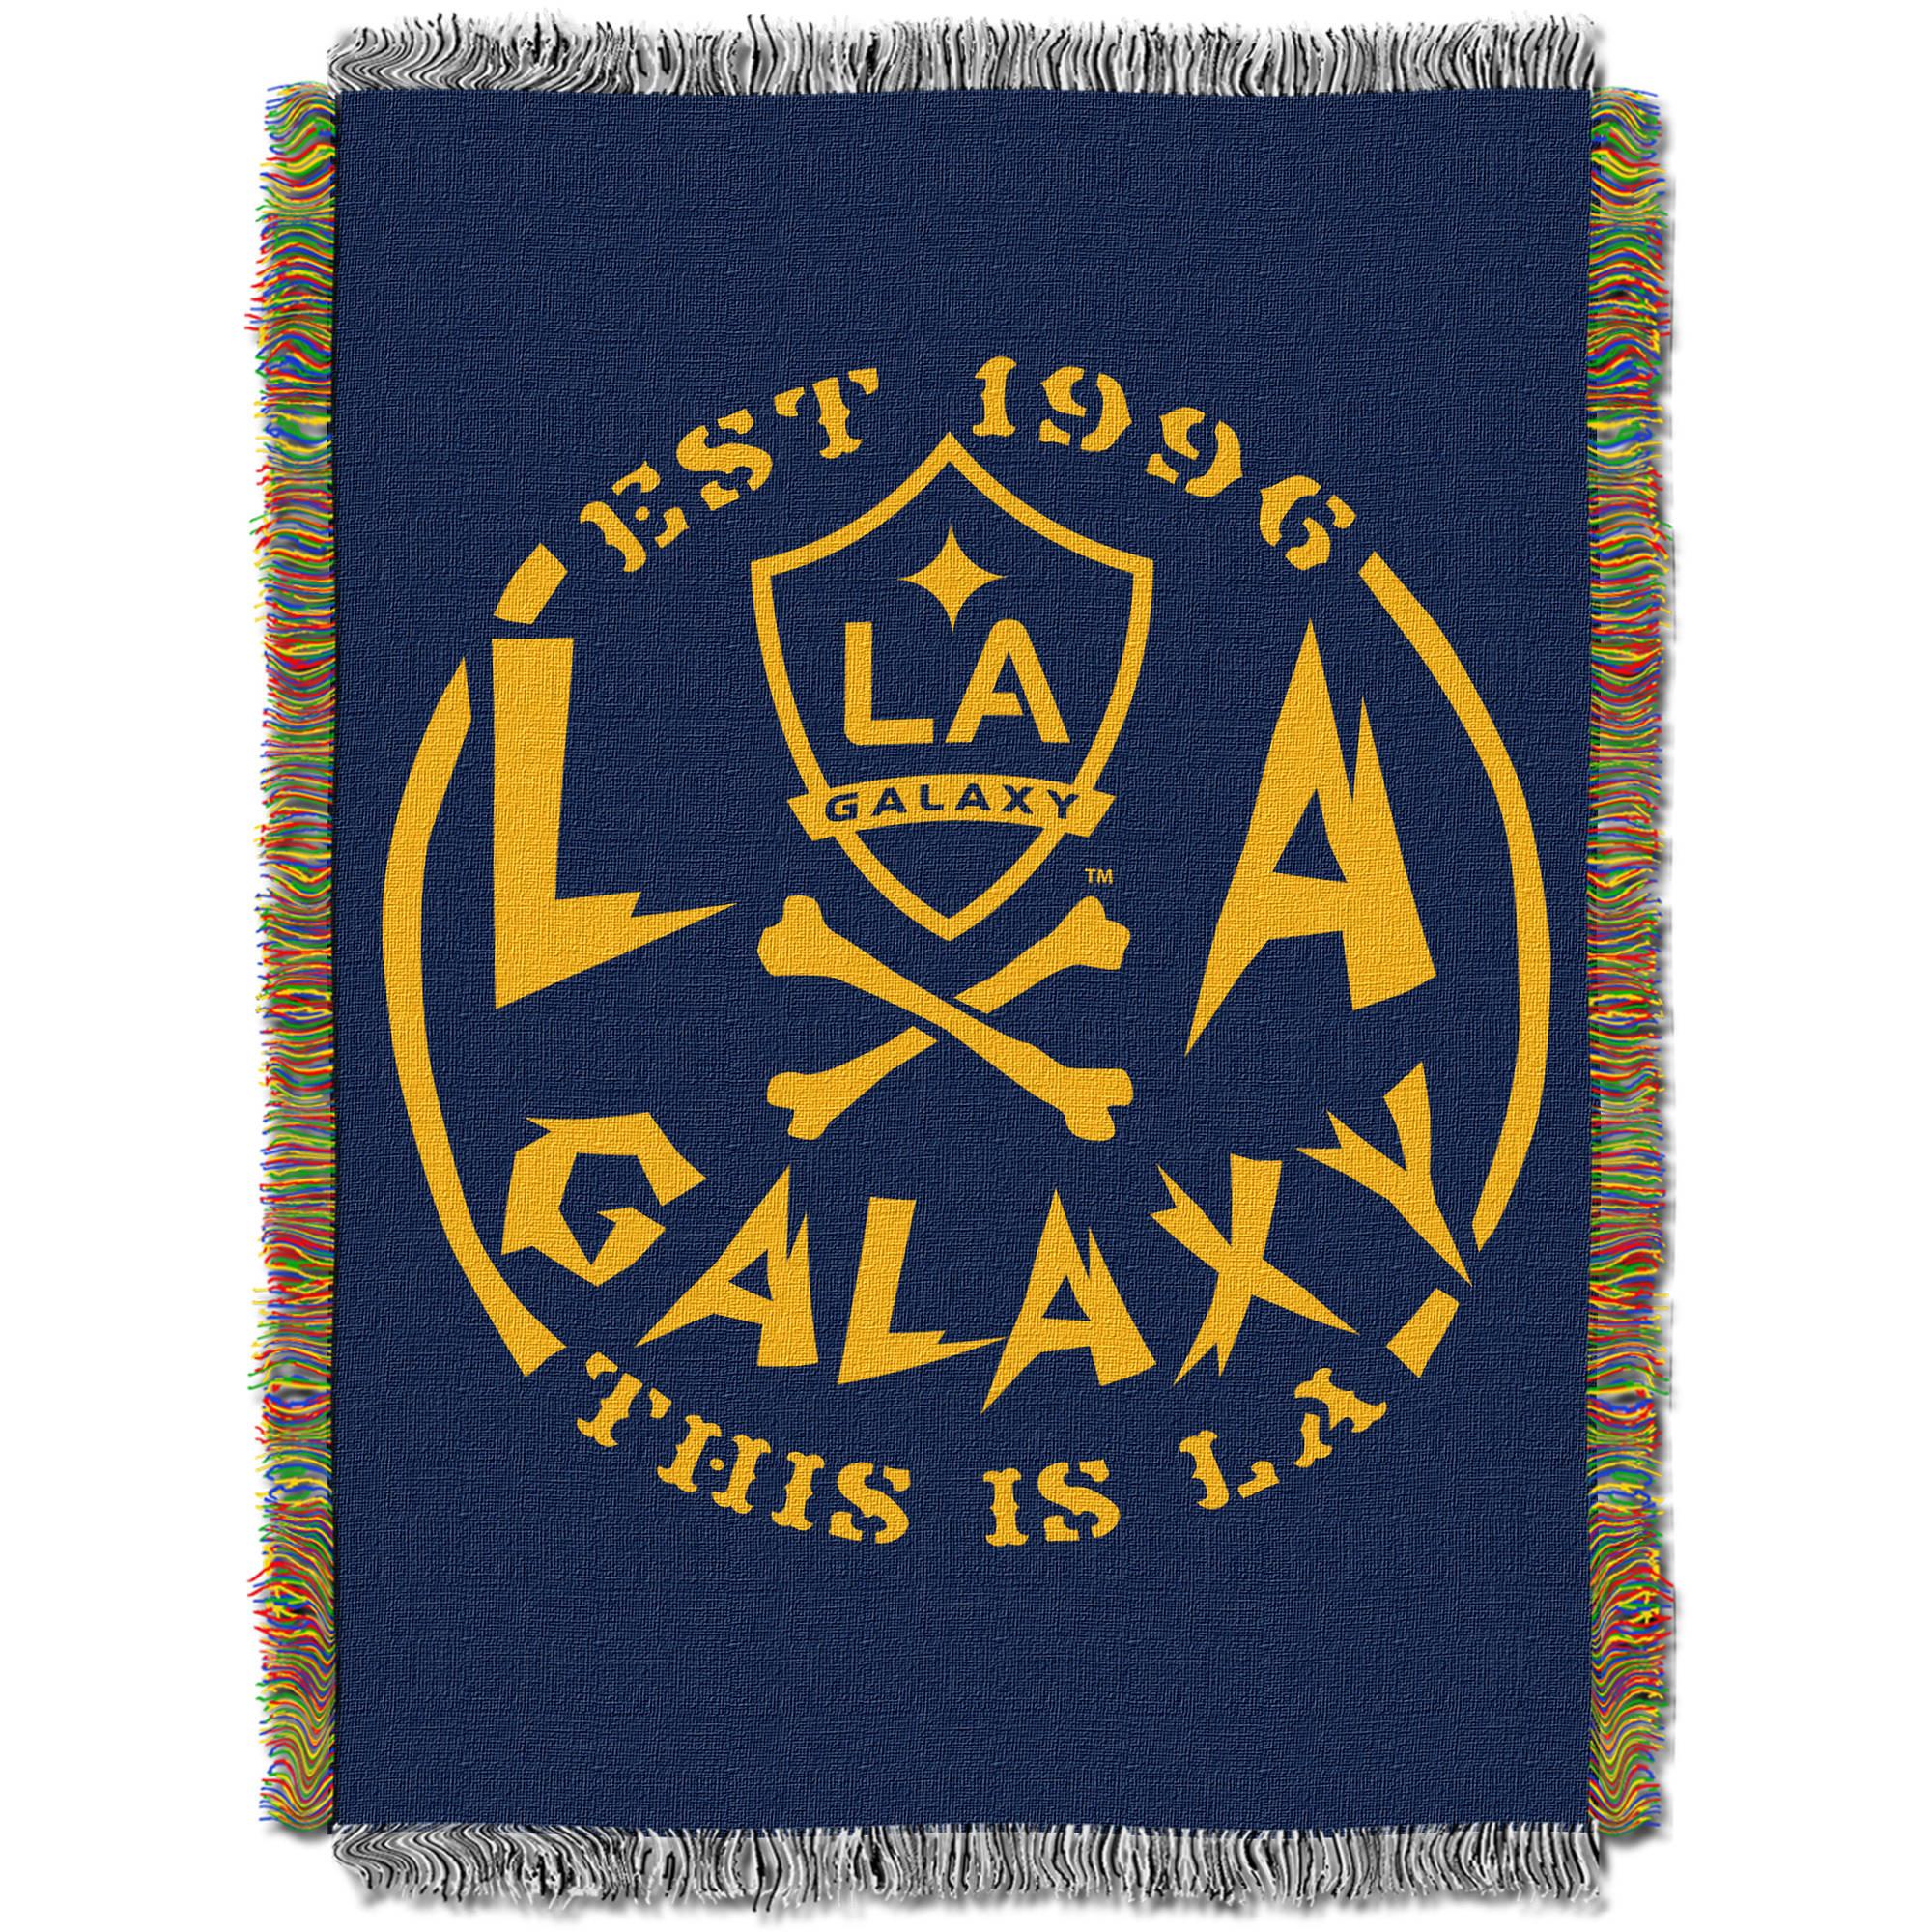 "MLS Los Angeles Galaxy Handmade 48"" x 60"" Woven Tapestry Throw"